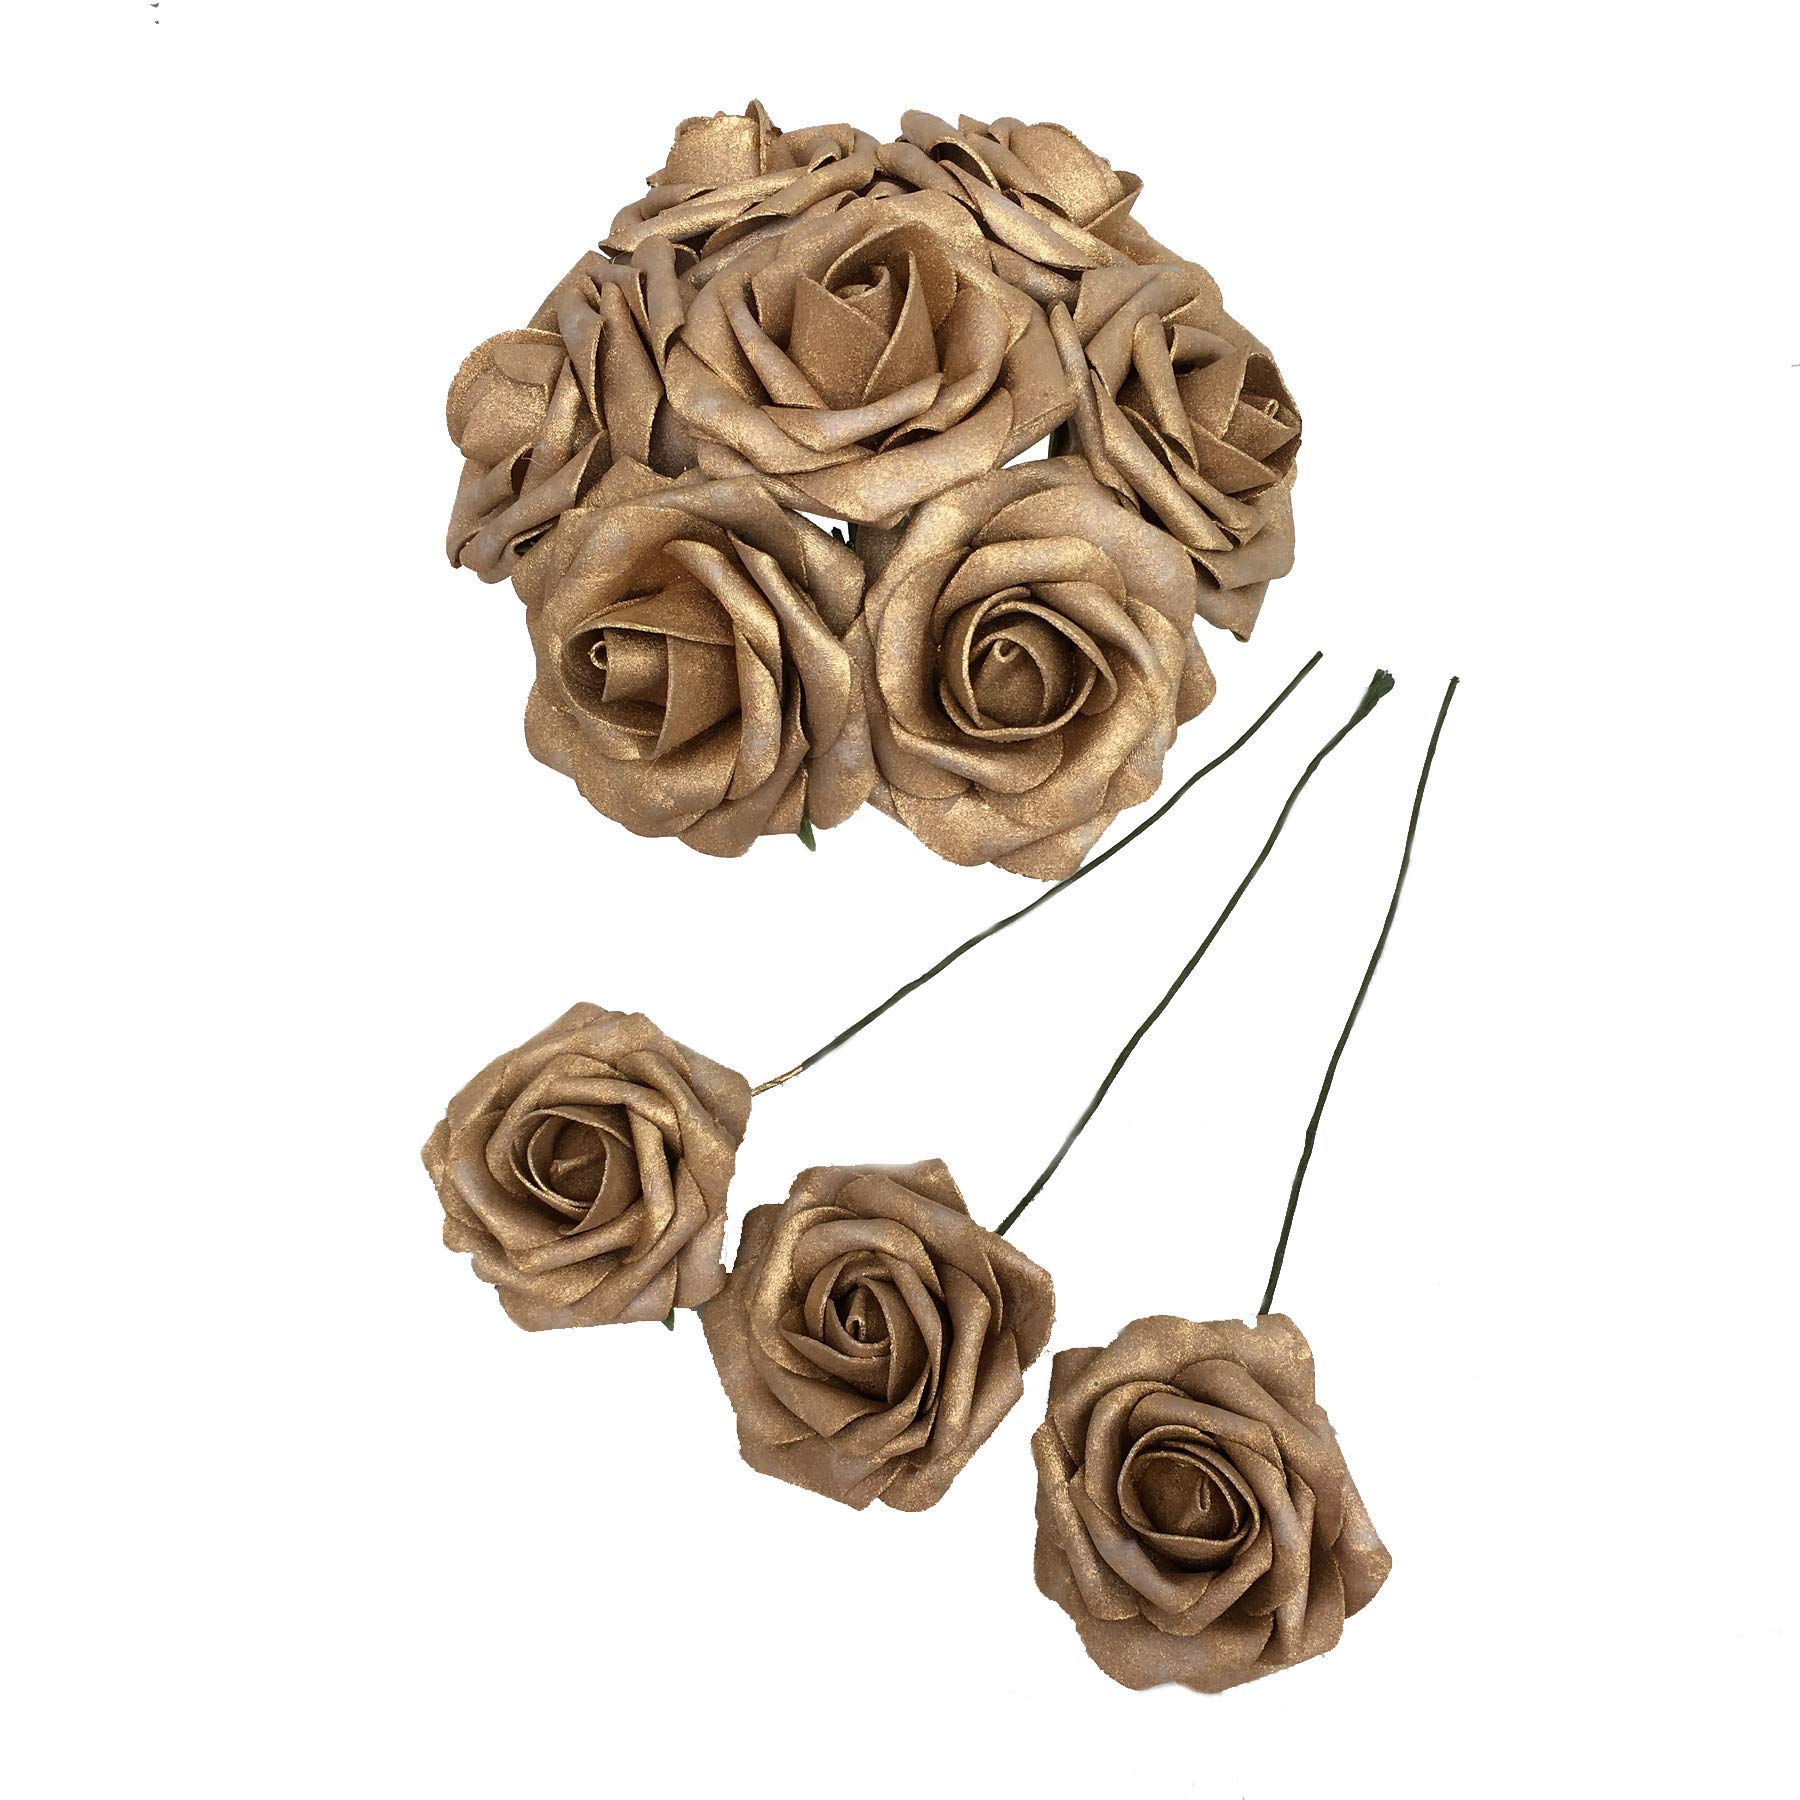 50-pcs-Artificial-Flowers-Foam-Roses-for-Bridal-Bouquets-Wedding-Centerpieces-Kissing-Balls-Gold